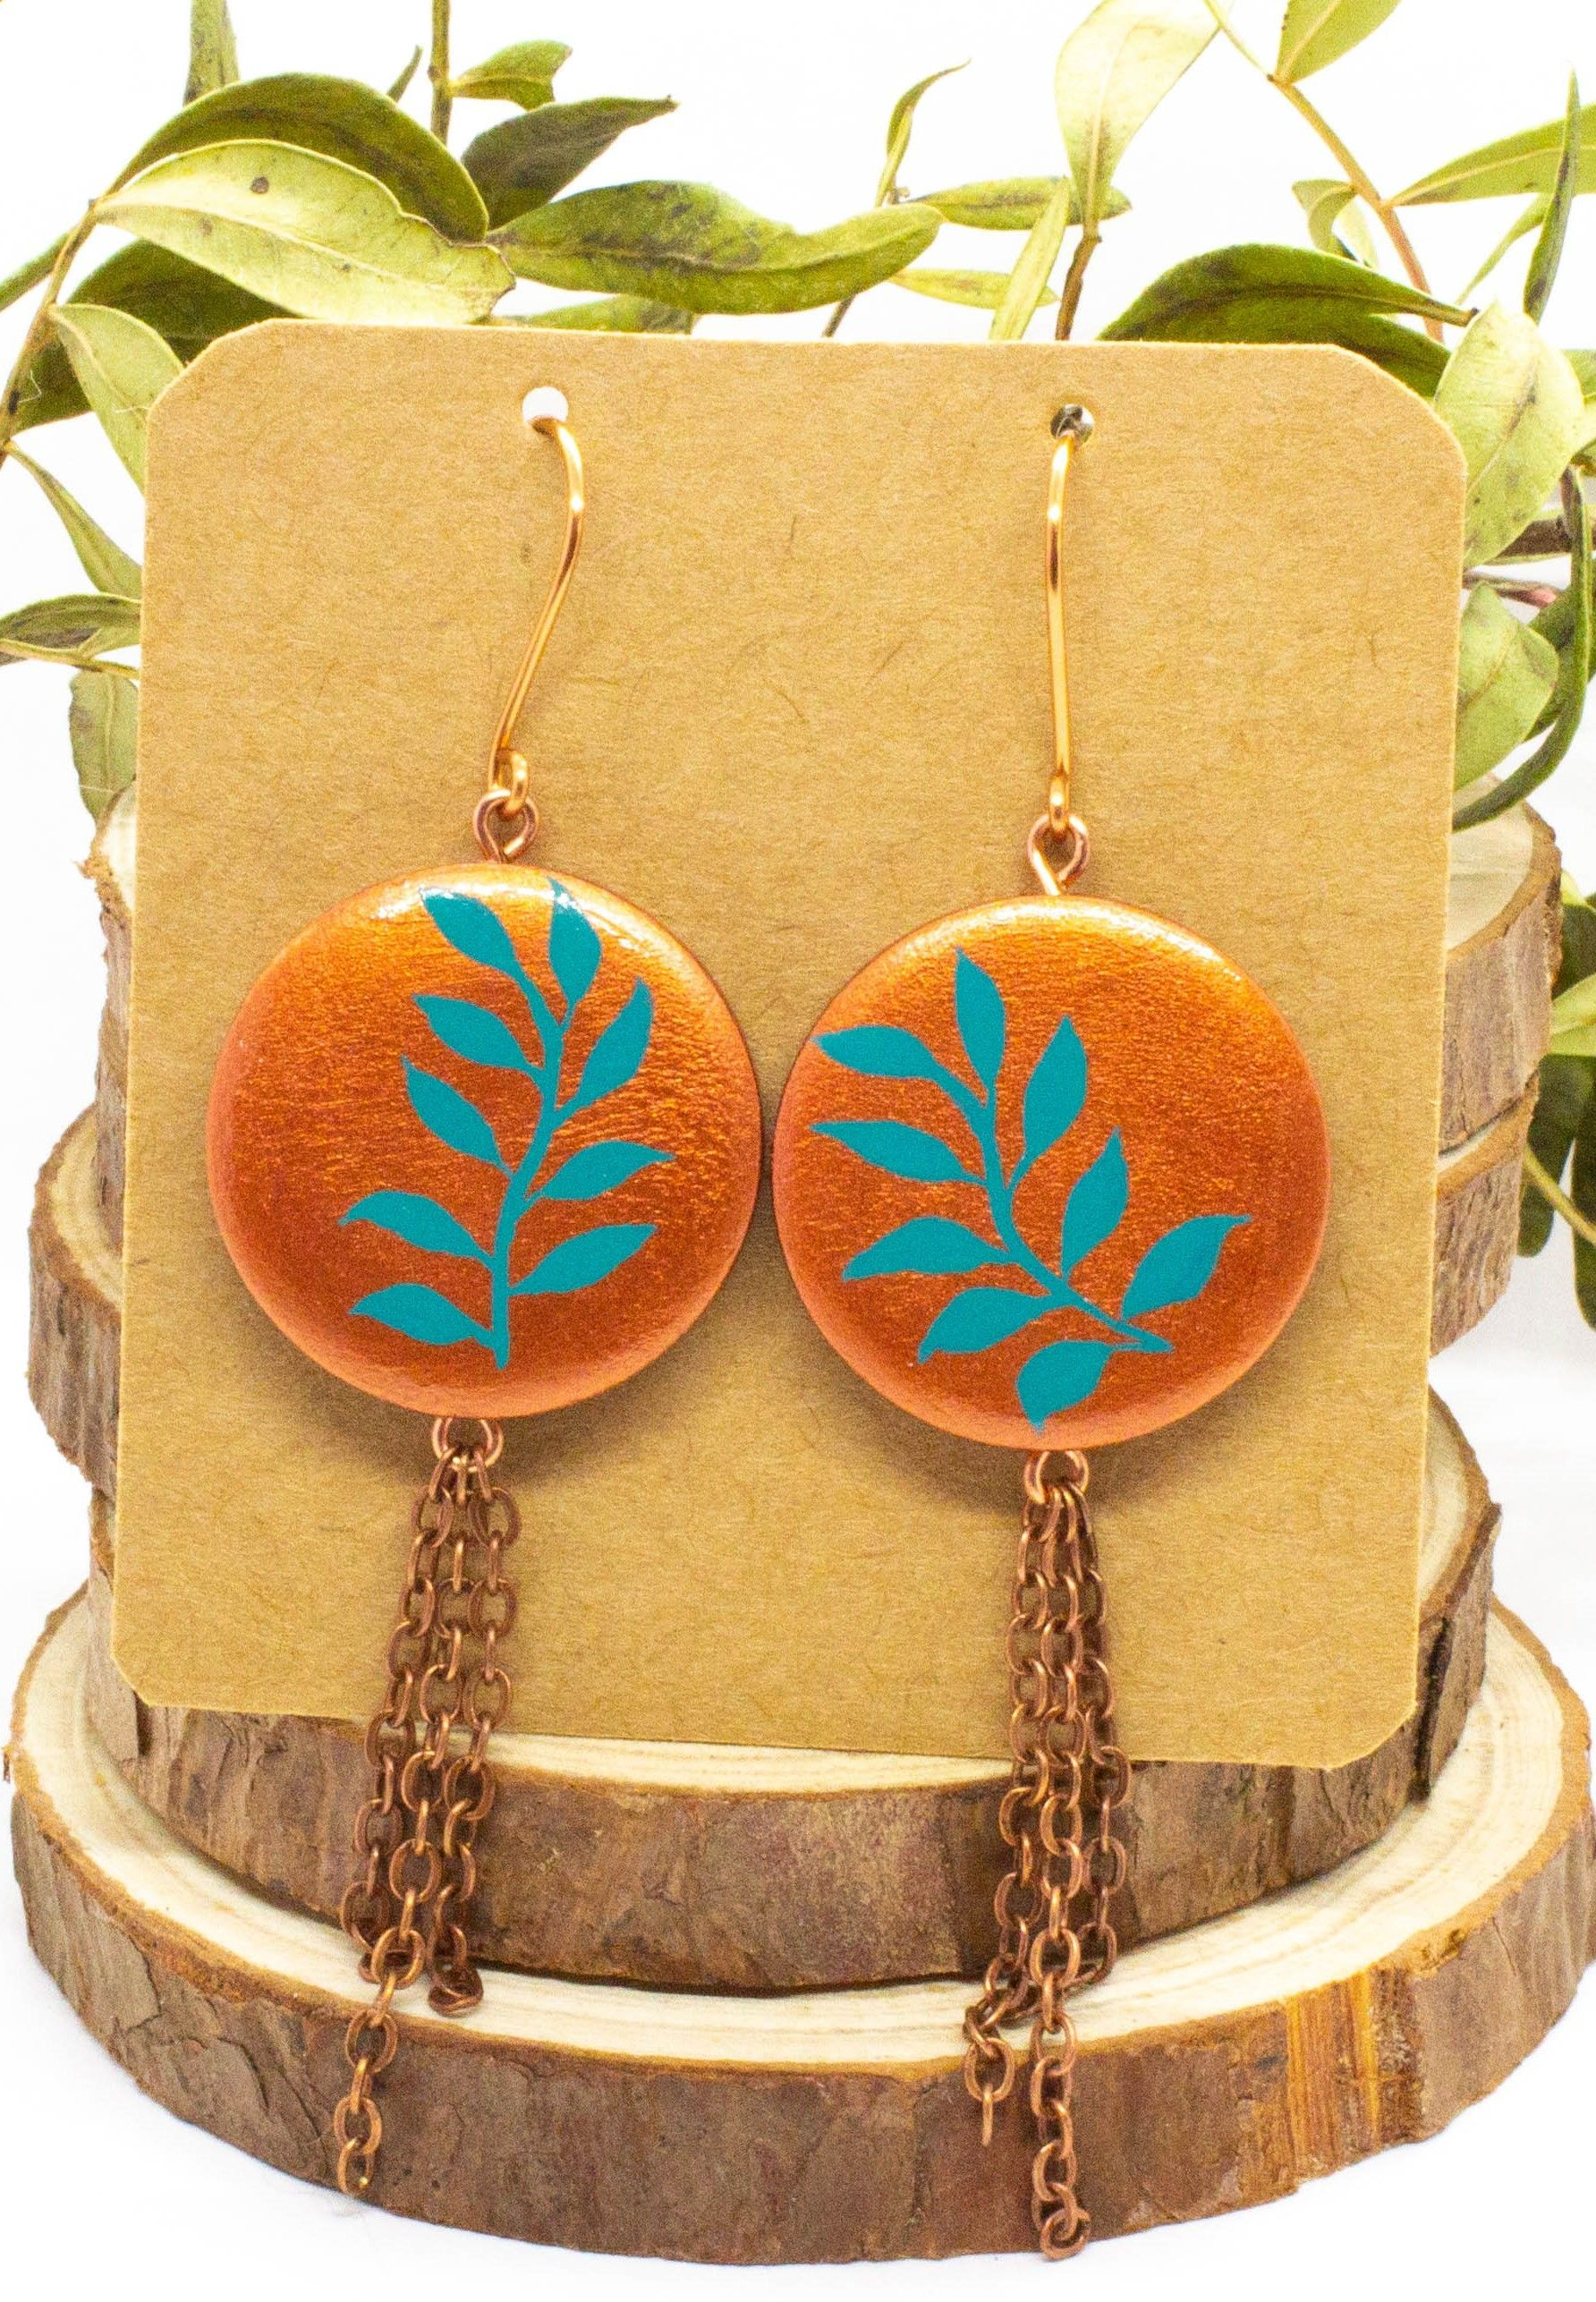 Hand Painted Wooden Earrings Copper Dangles Nature Inspired Etsy Nature Inspired Handmade Jewelry Hand Painted Jewelry Copper Jewelry Handmade